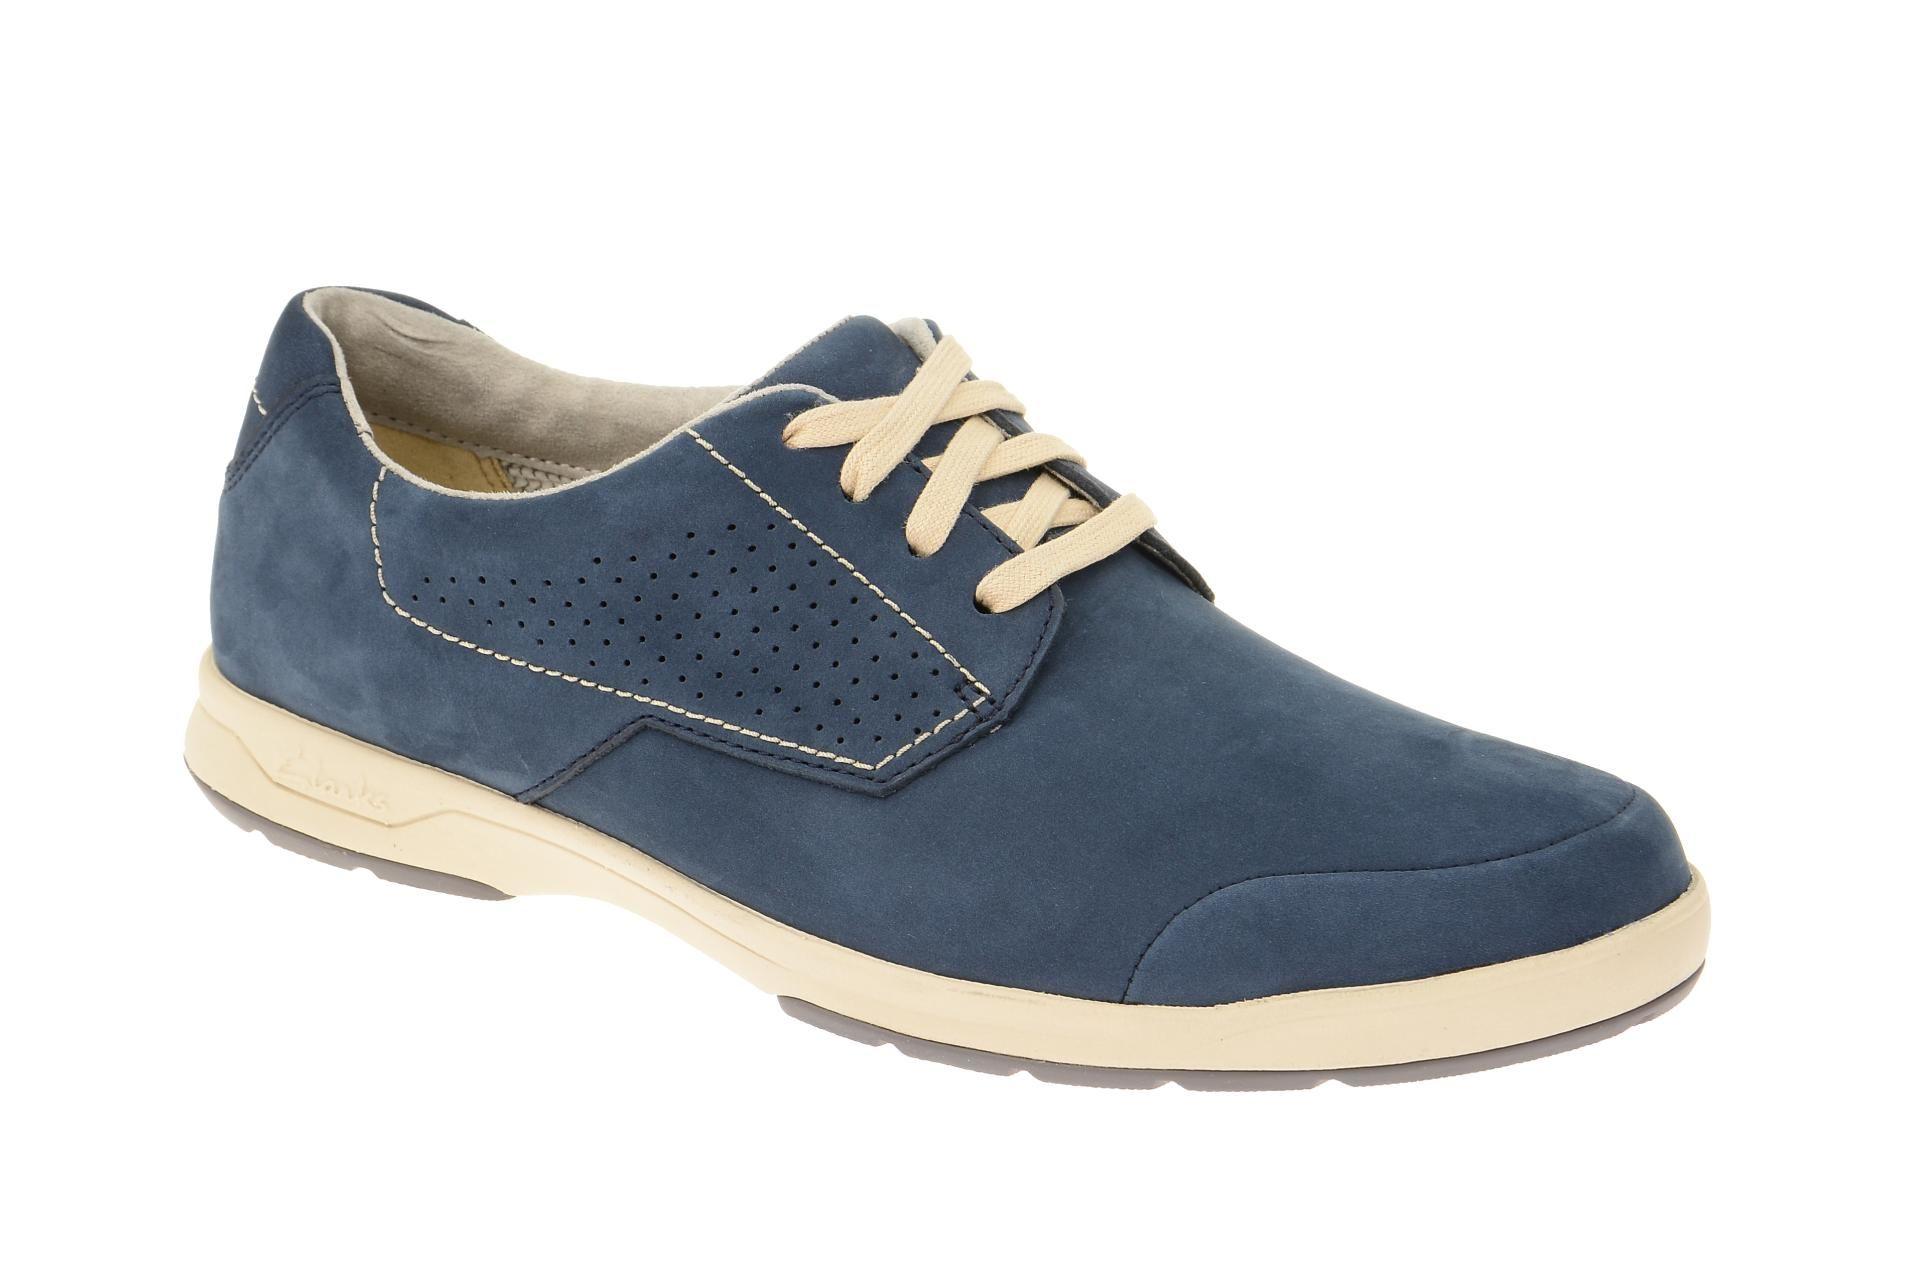 best service c560d e4235 Clarks Stafford Plan Schuhe blau Nubuck in 2019 | mode ...